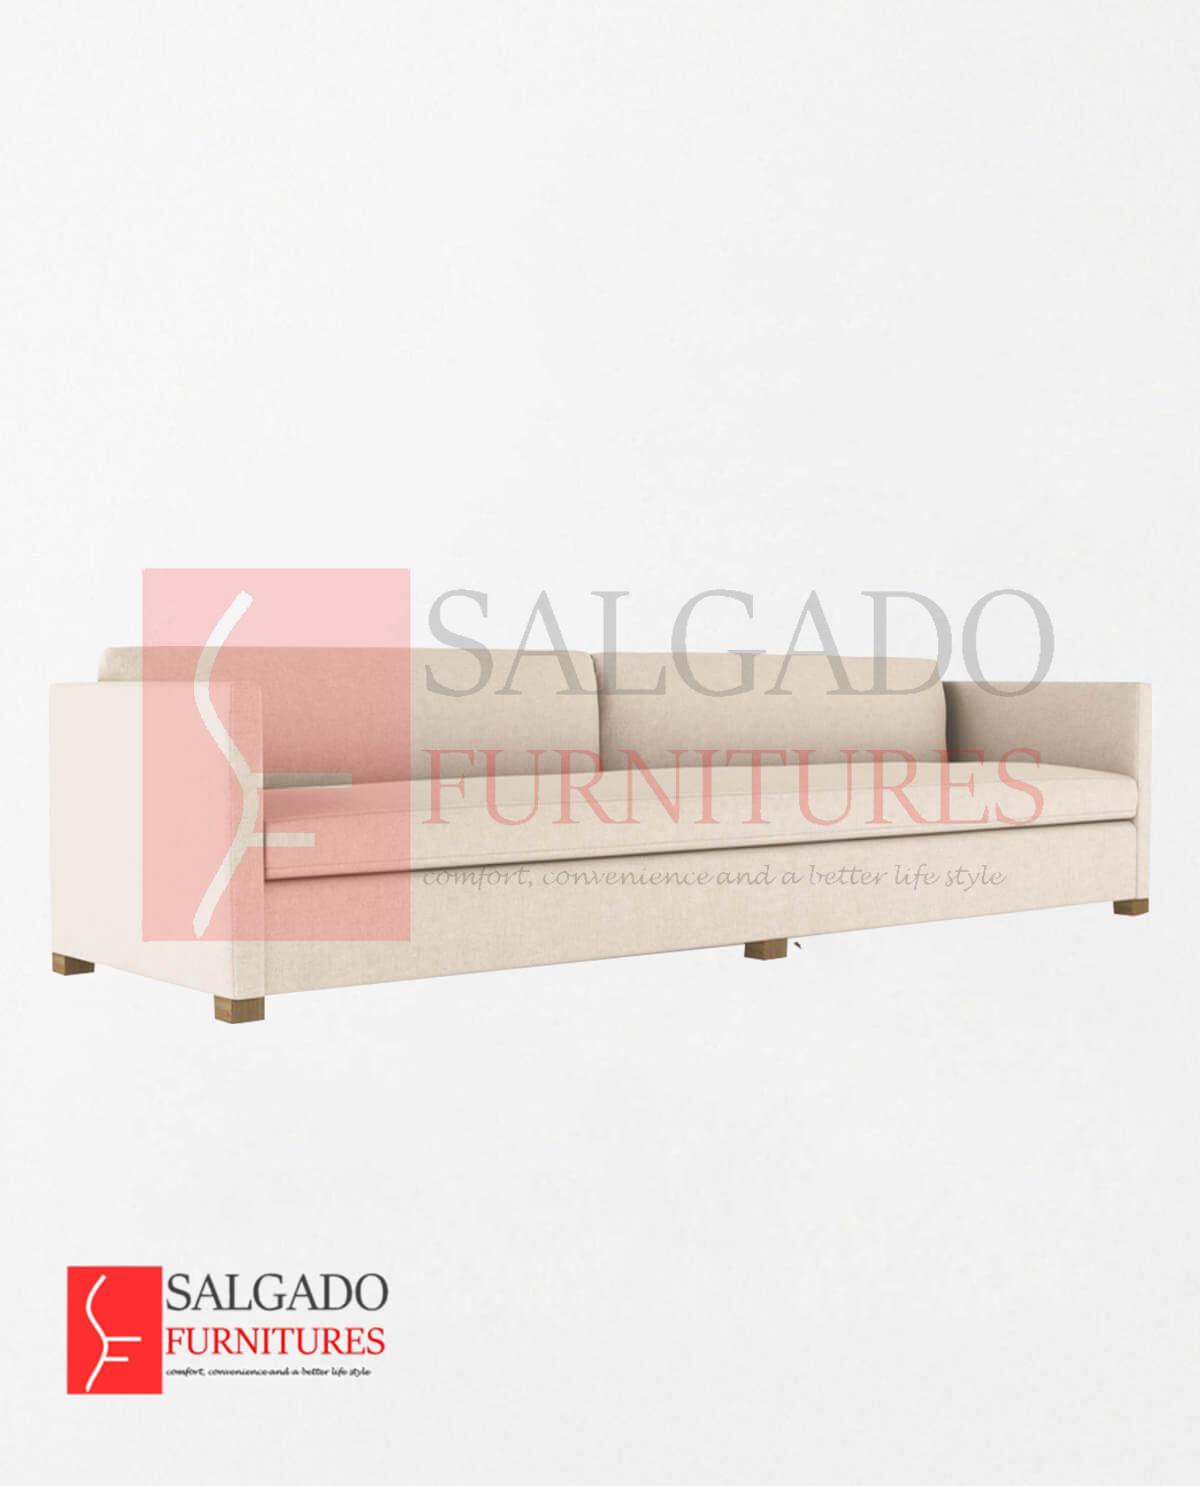 furniture-sri lanka-facebook